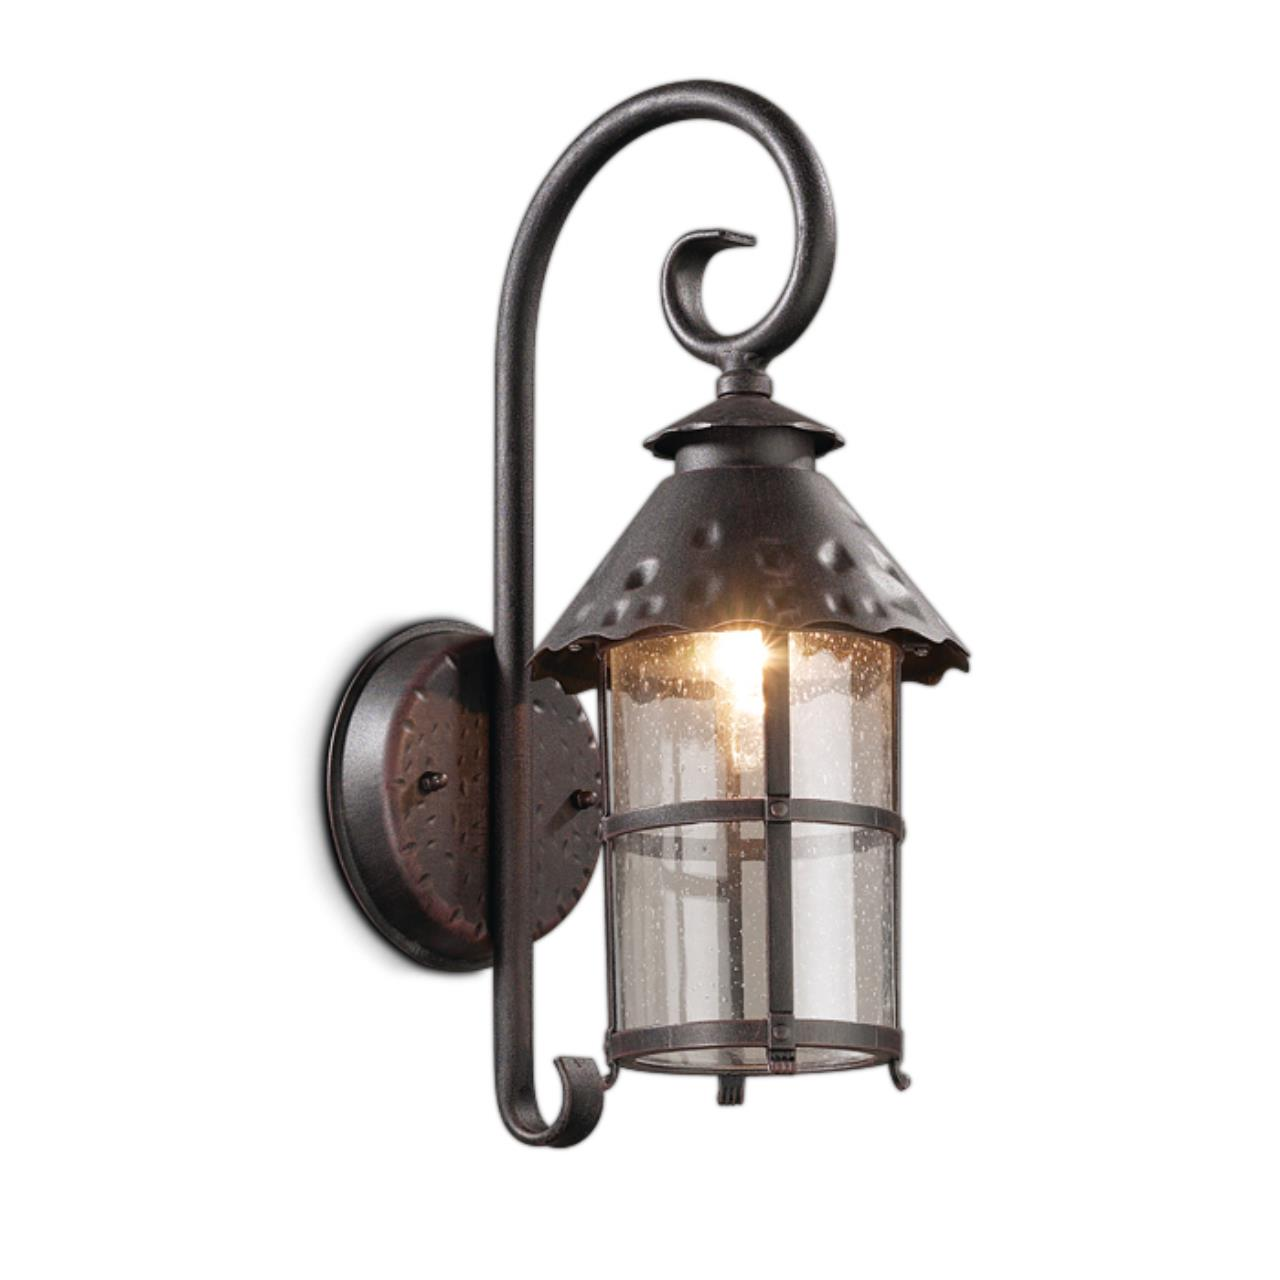 2312/1W NATURE ODL12 717 коричневый Уличный настен светильник IP44 E27 60W 220V LUMI